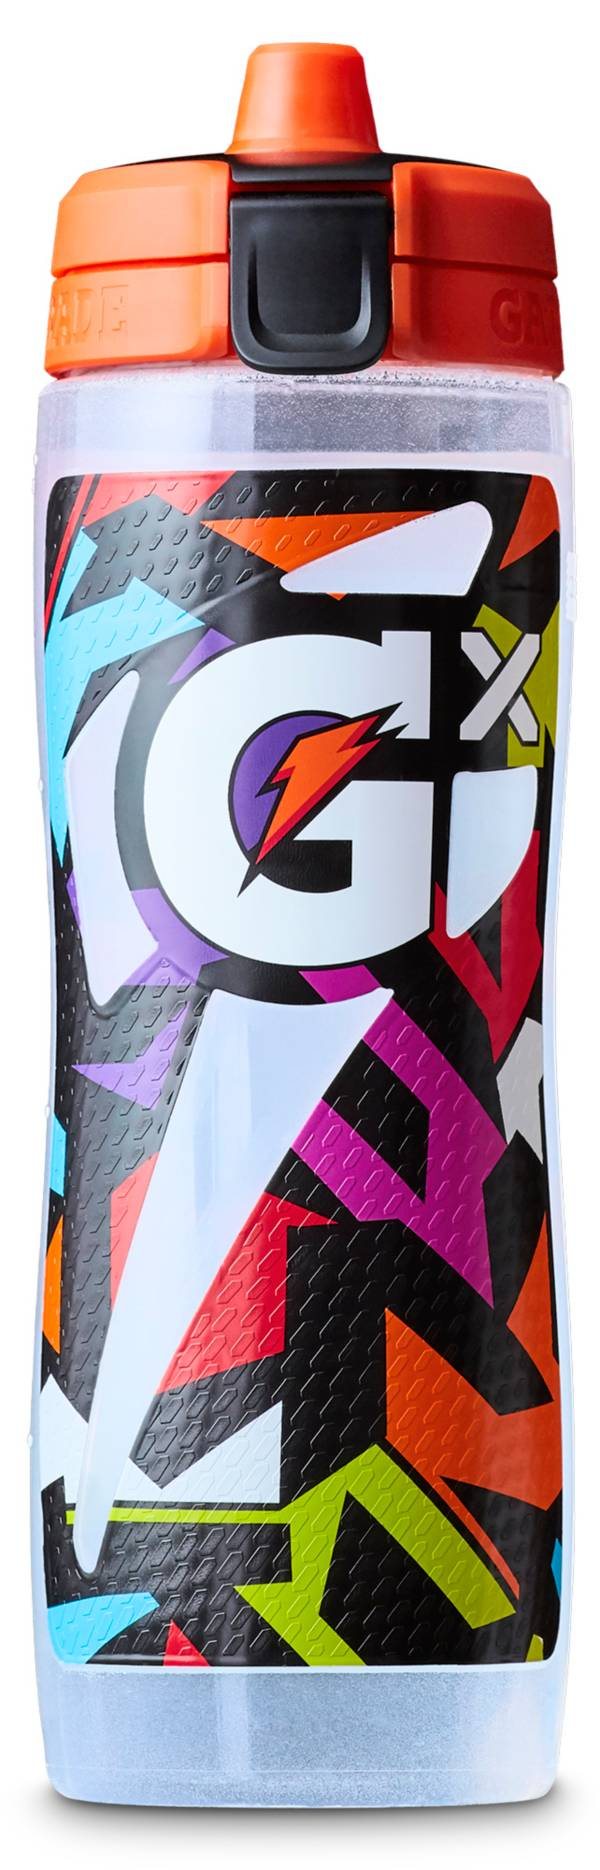 Gatorade Gx Serena Williams 30 oz. Limited Edition Bottle product image